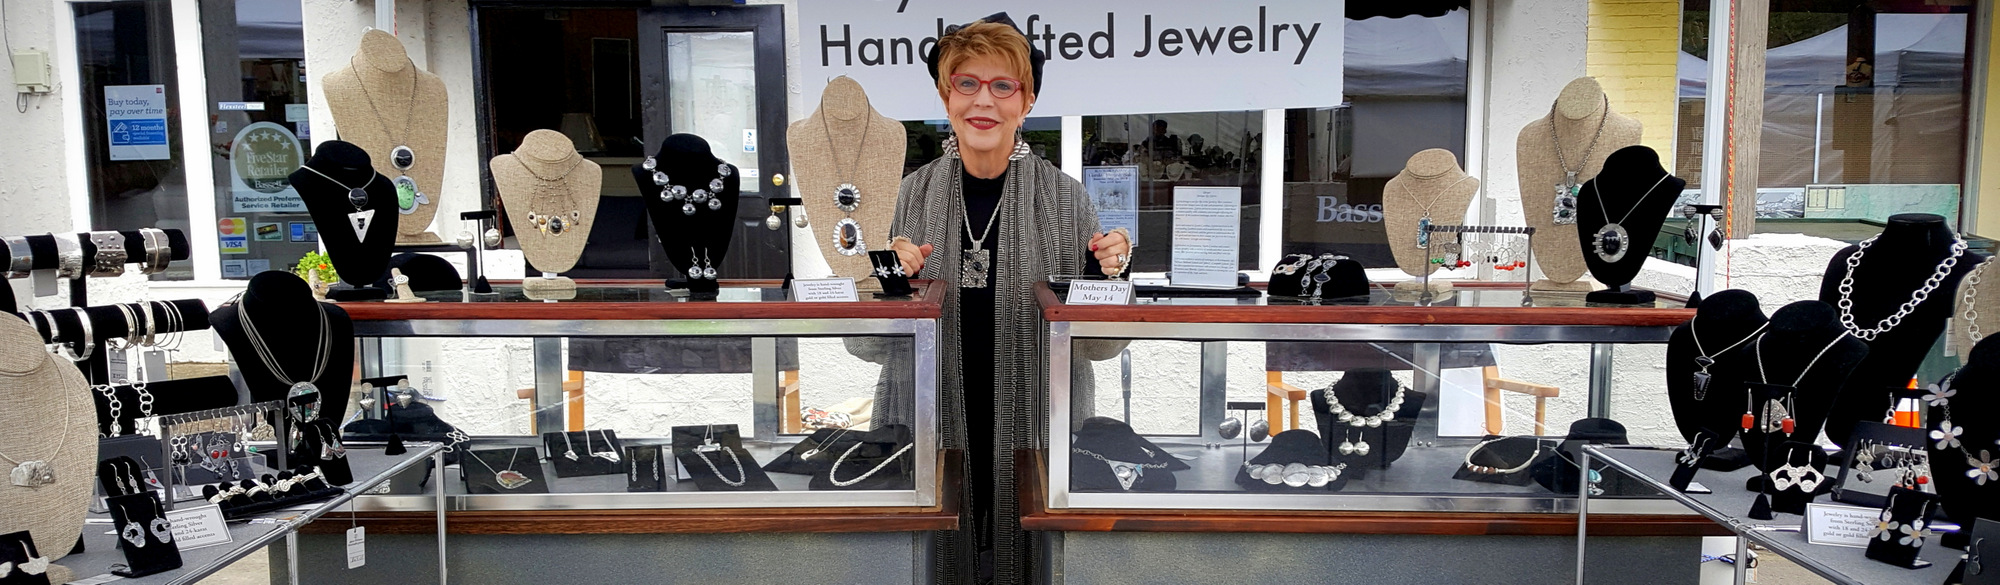 Fine Art Siver & Gold Jewelry, Sylvia McCollum.jpg